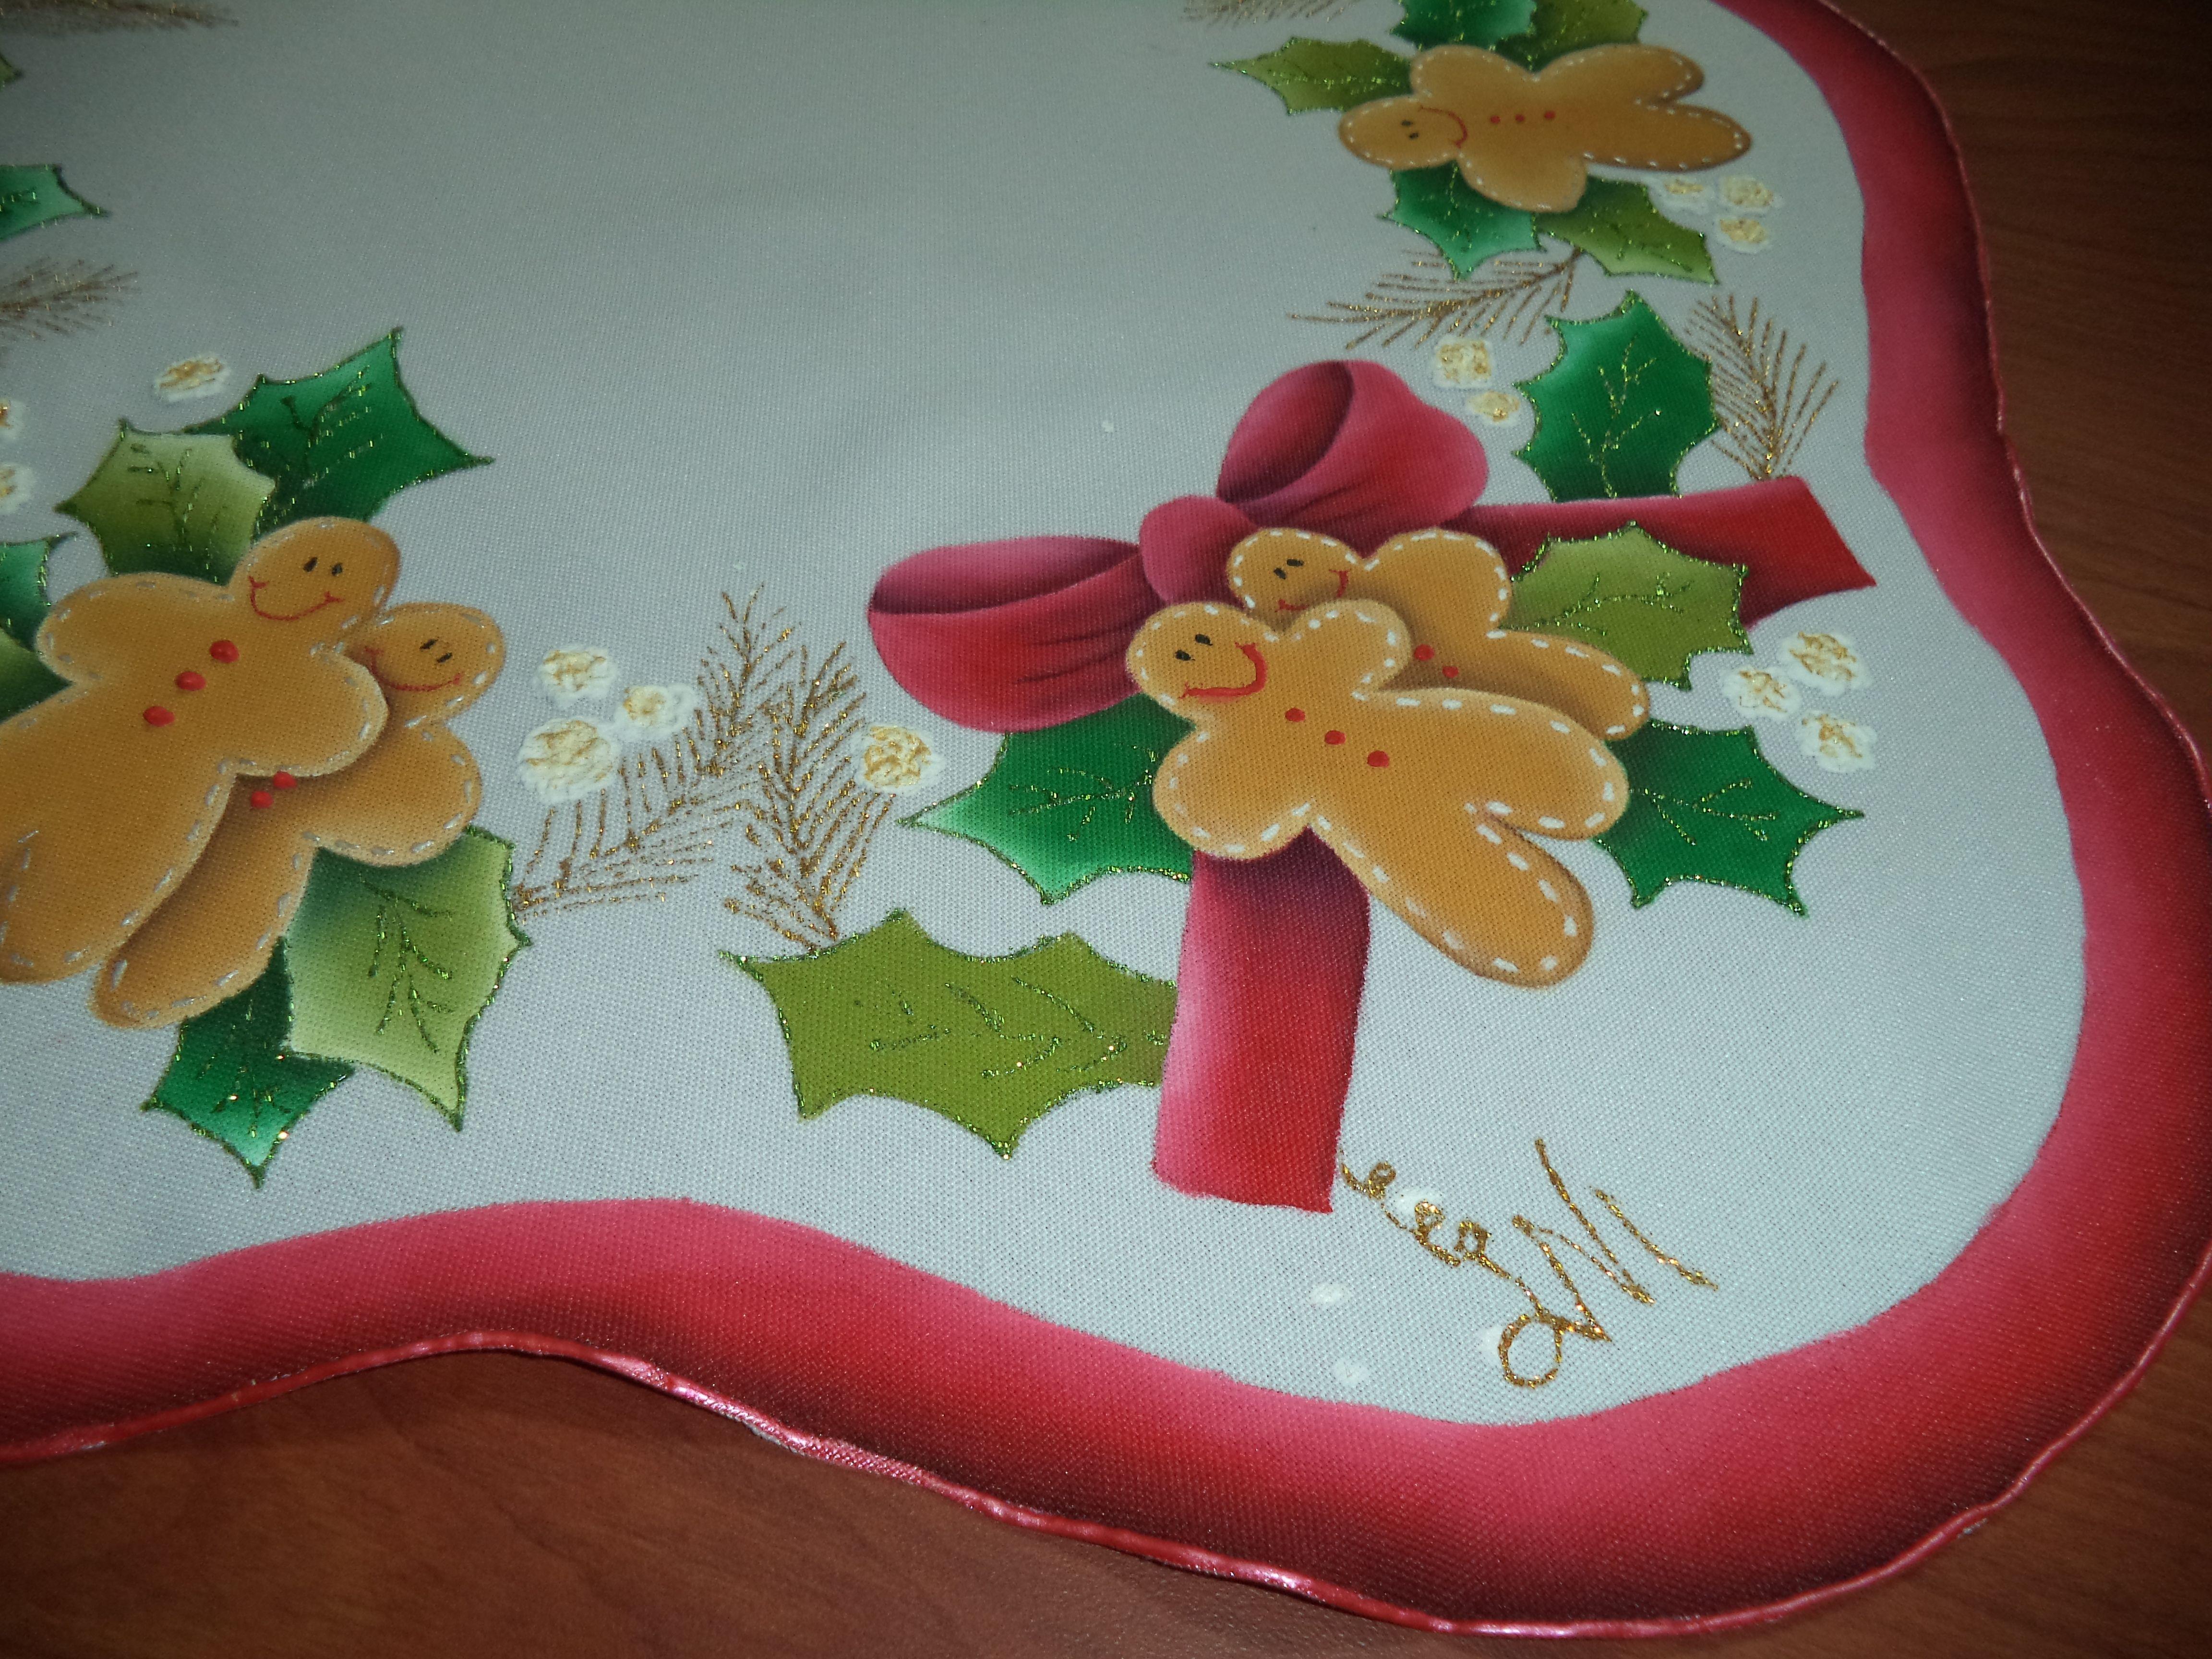 Motivos navide os pintura4 pintura en tela navidad y - Motivos navidenos para pintar en tela ...